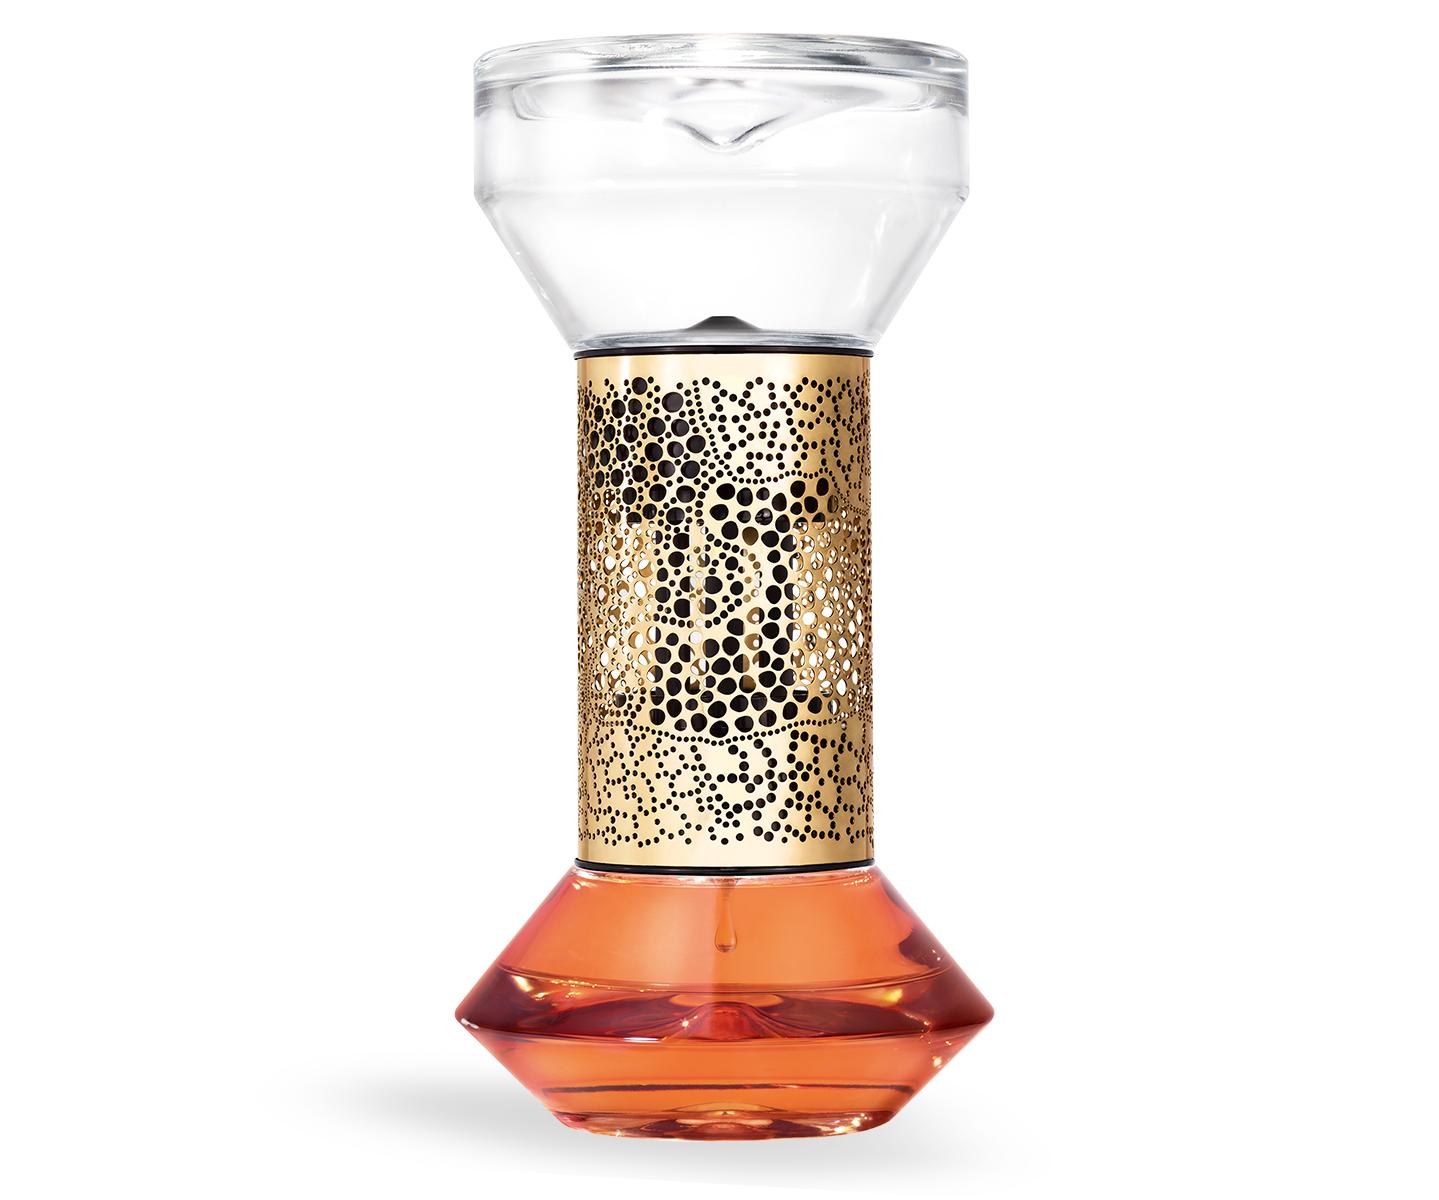 Fleur d'Oranger / Orange Blossom Hourglass Diffuser 2.0